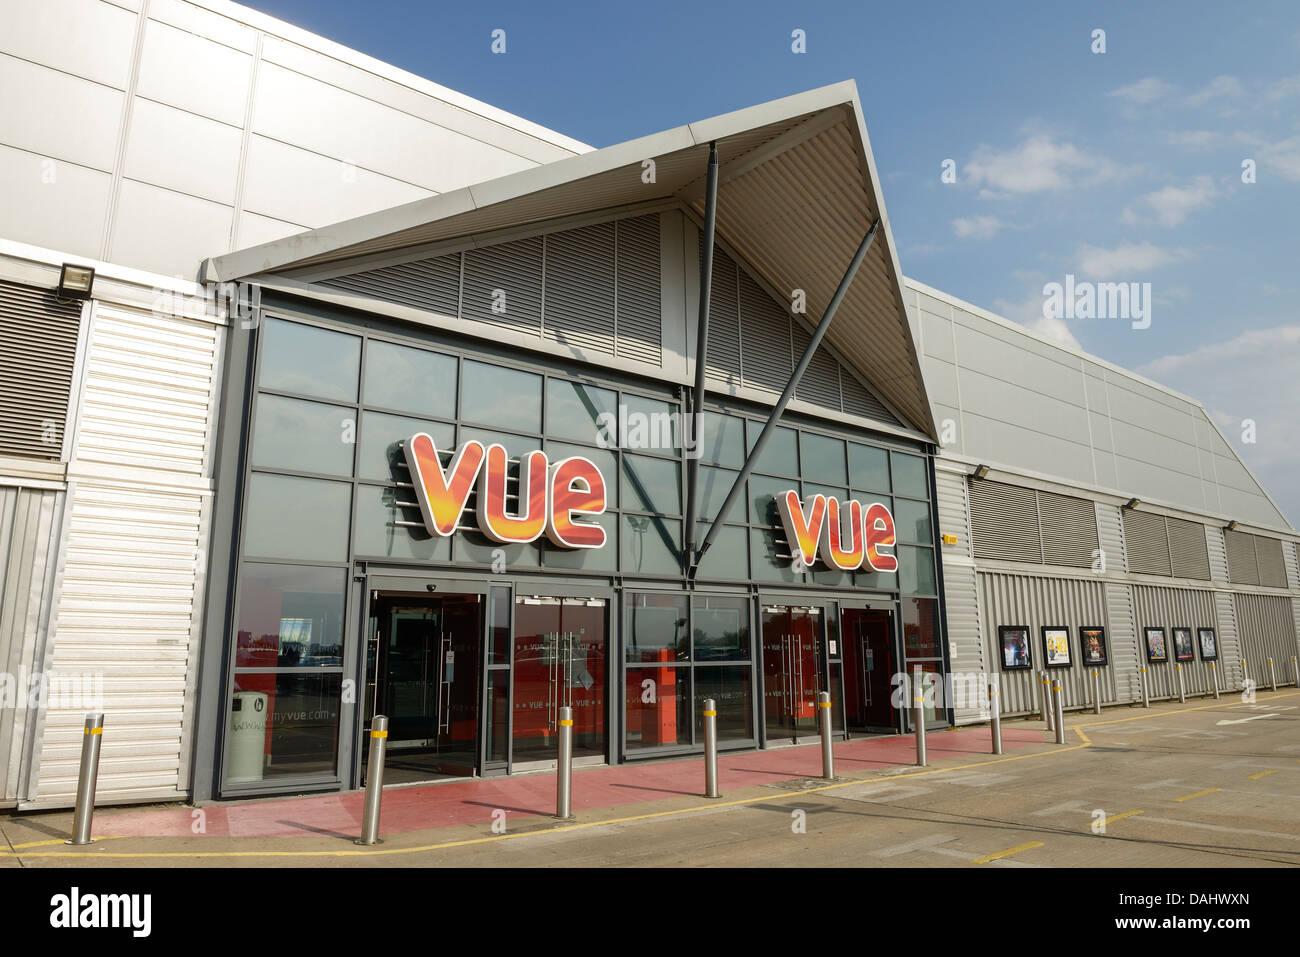 Vue Cinema entrance at Princes Quay Hull UK - Stock Image